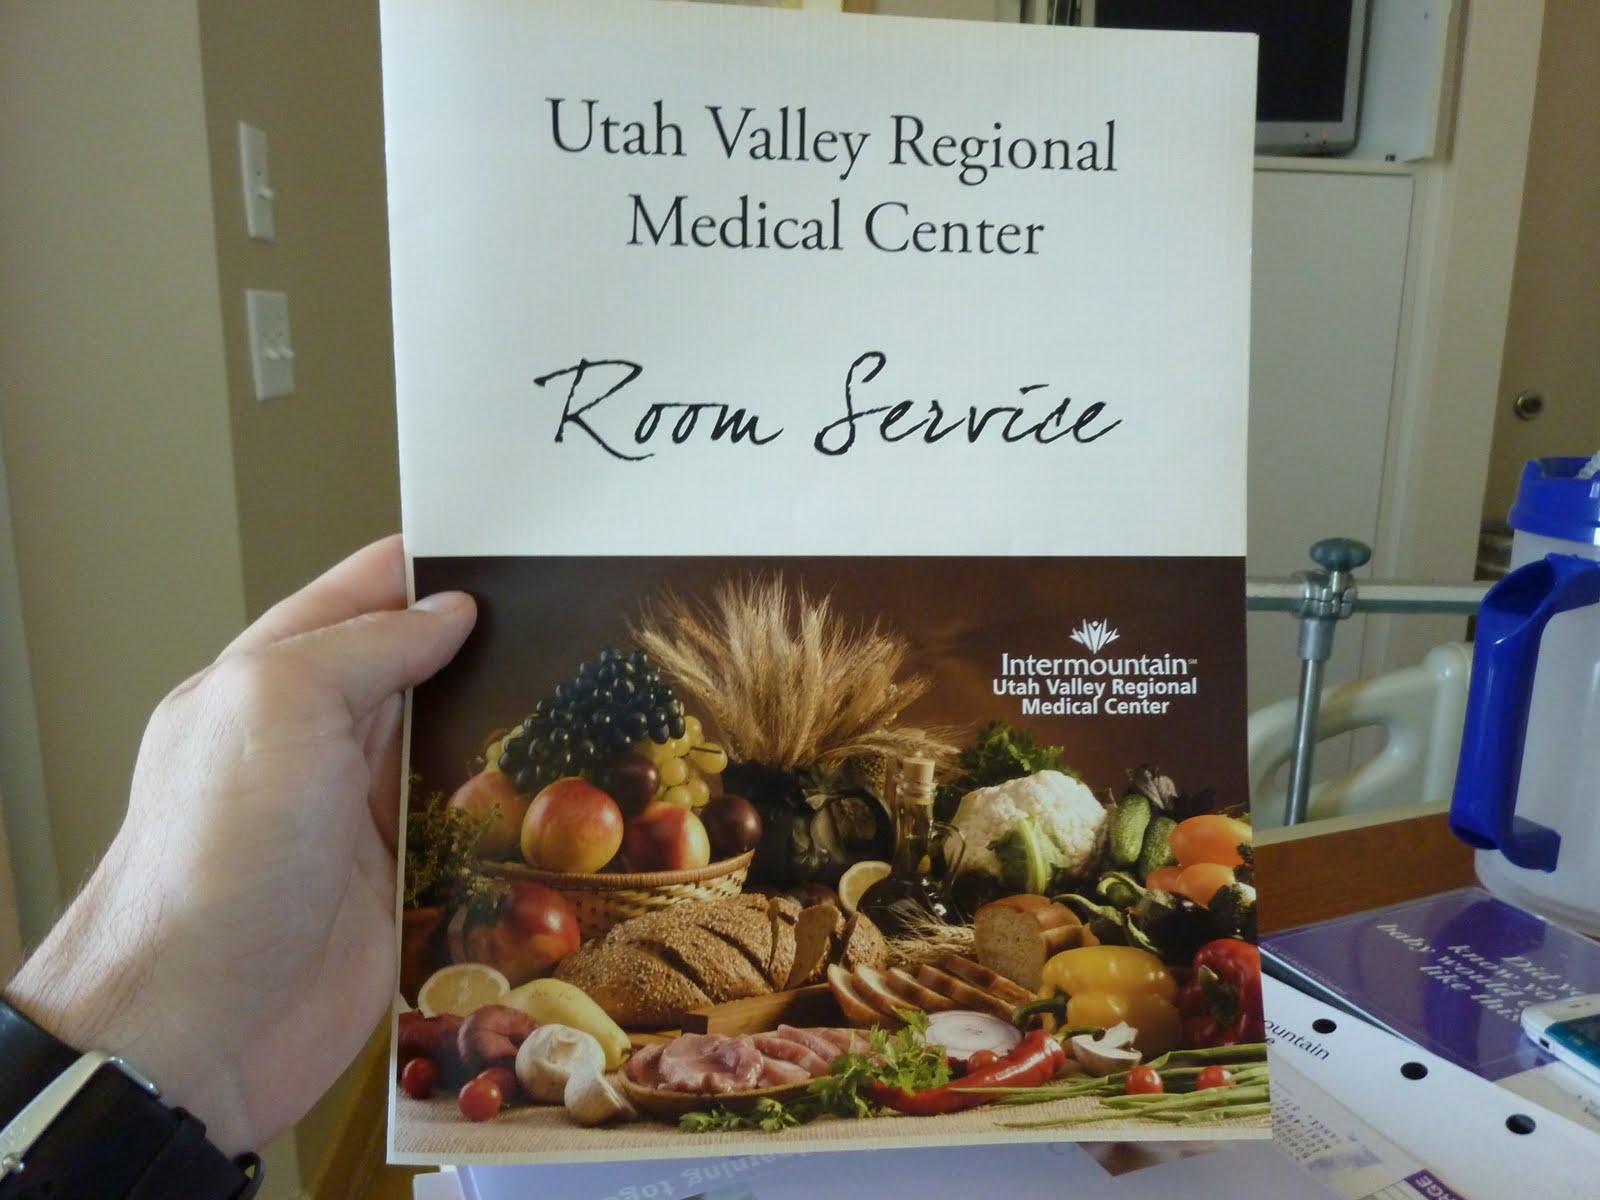 Room Service: Jonesberries: Hospital